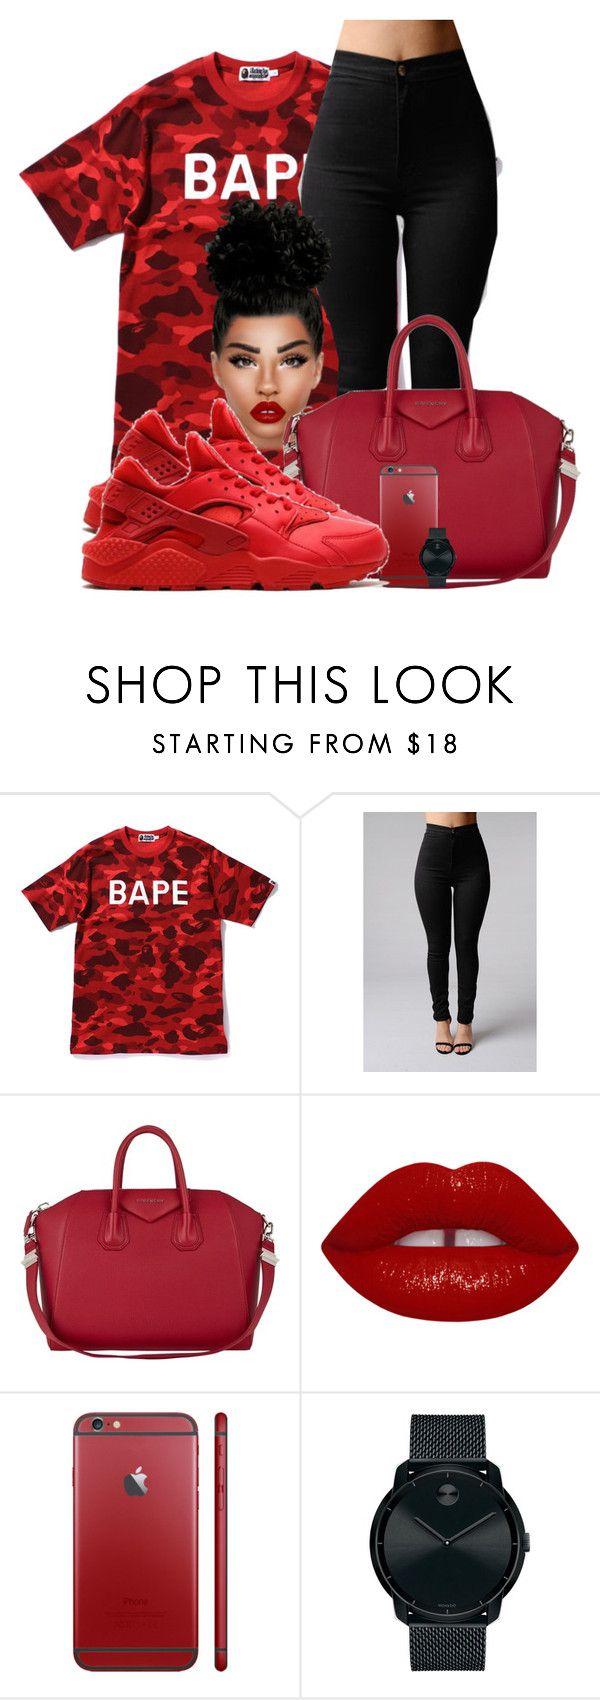 """Red bape"" by chiamaka-ikaraoha ❤ liked on Polyvore featuring A BATHING APE, Givenchy, NIKE and Movado"